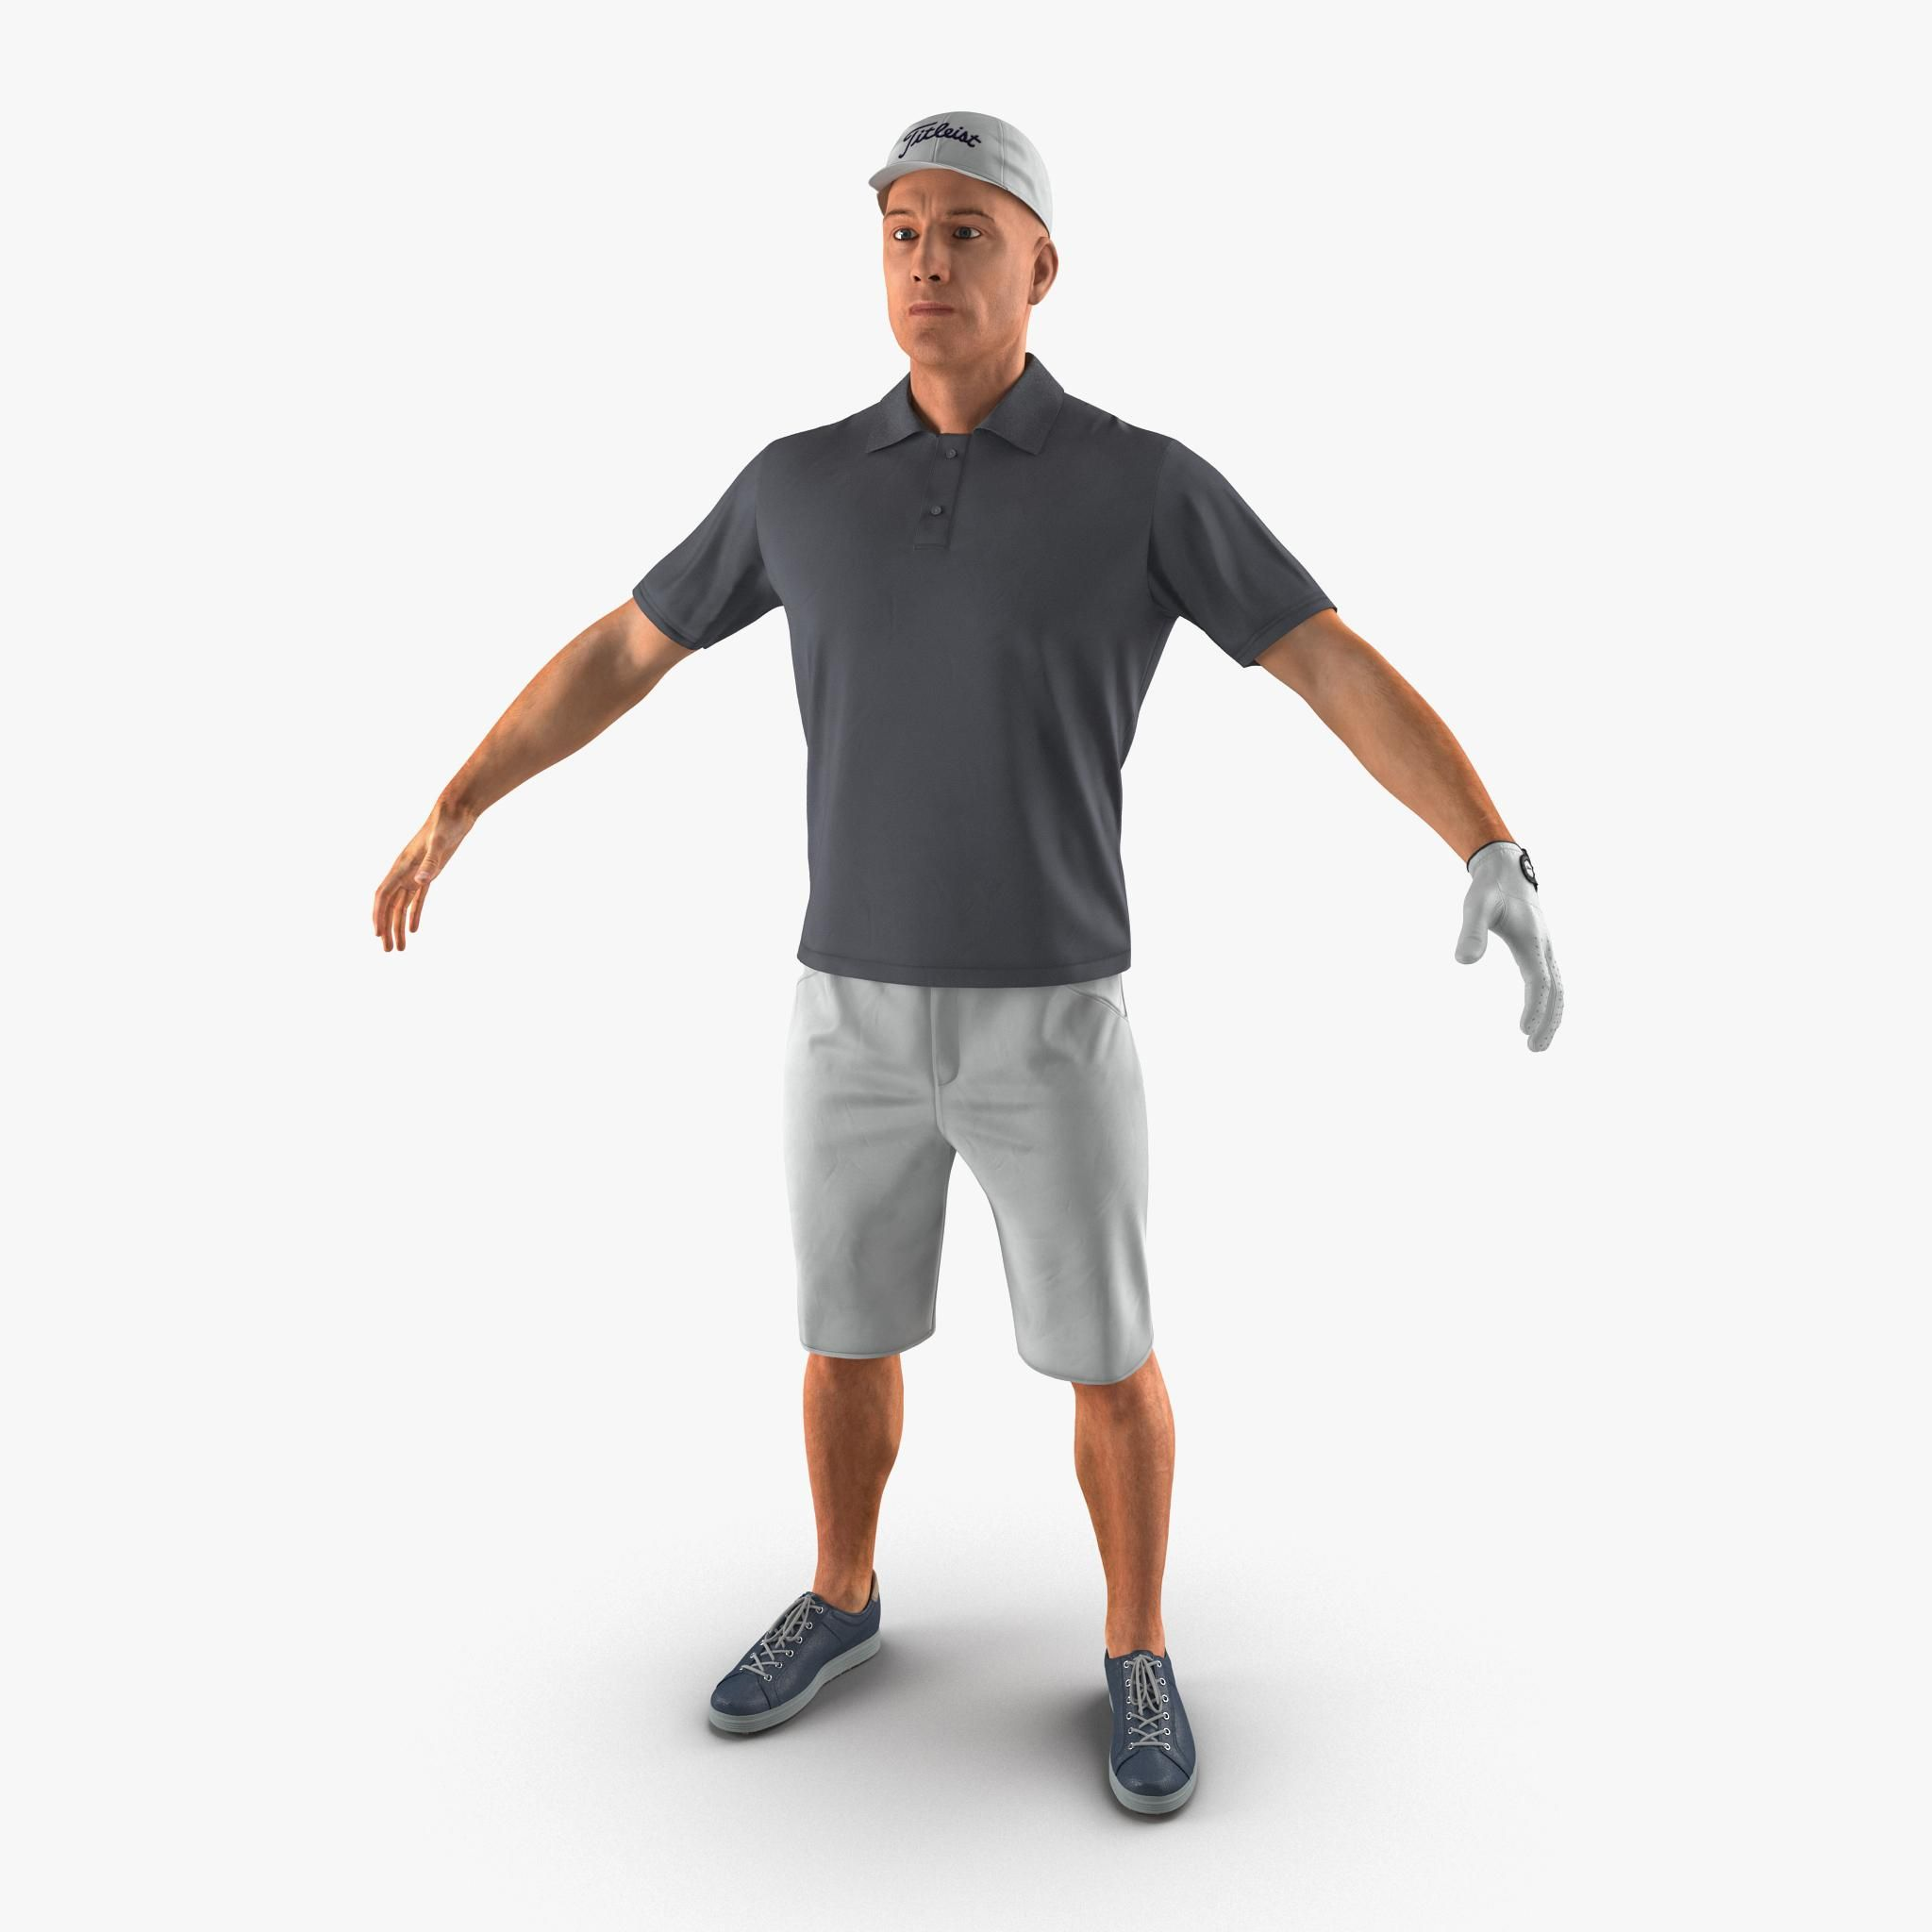 Golf Player 2 3D Model #AD ,#Golf#Player#Model